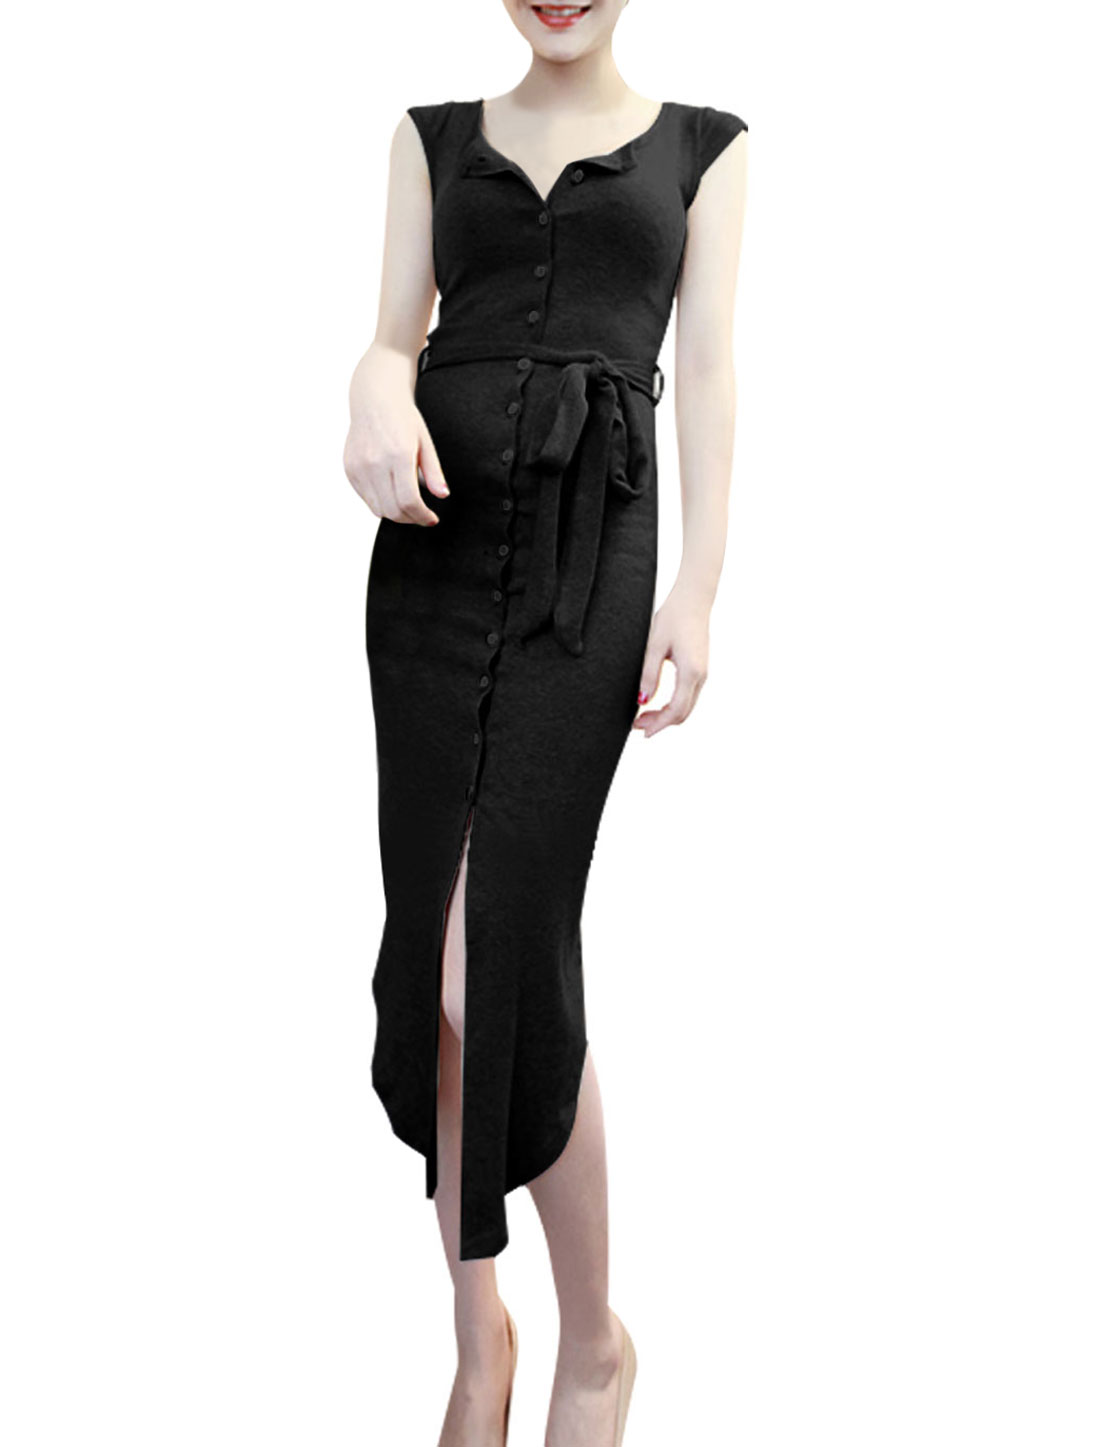 Lady Cap Sleeve Single Breasted Belt Loop Shirt Dress w Waist Strap Black XS